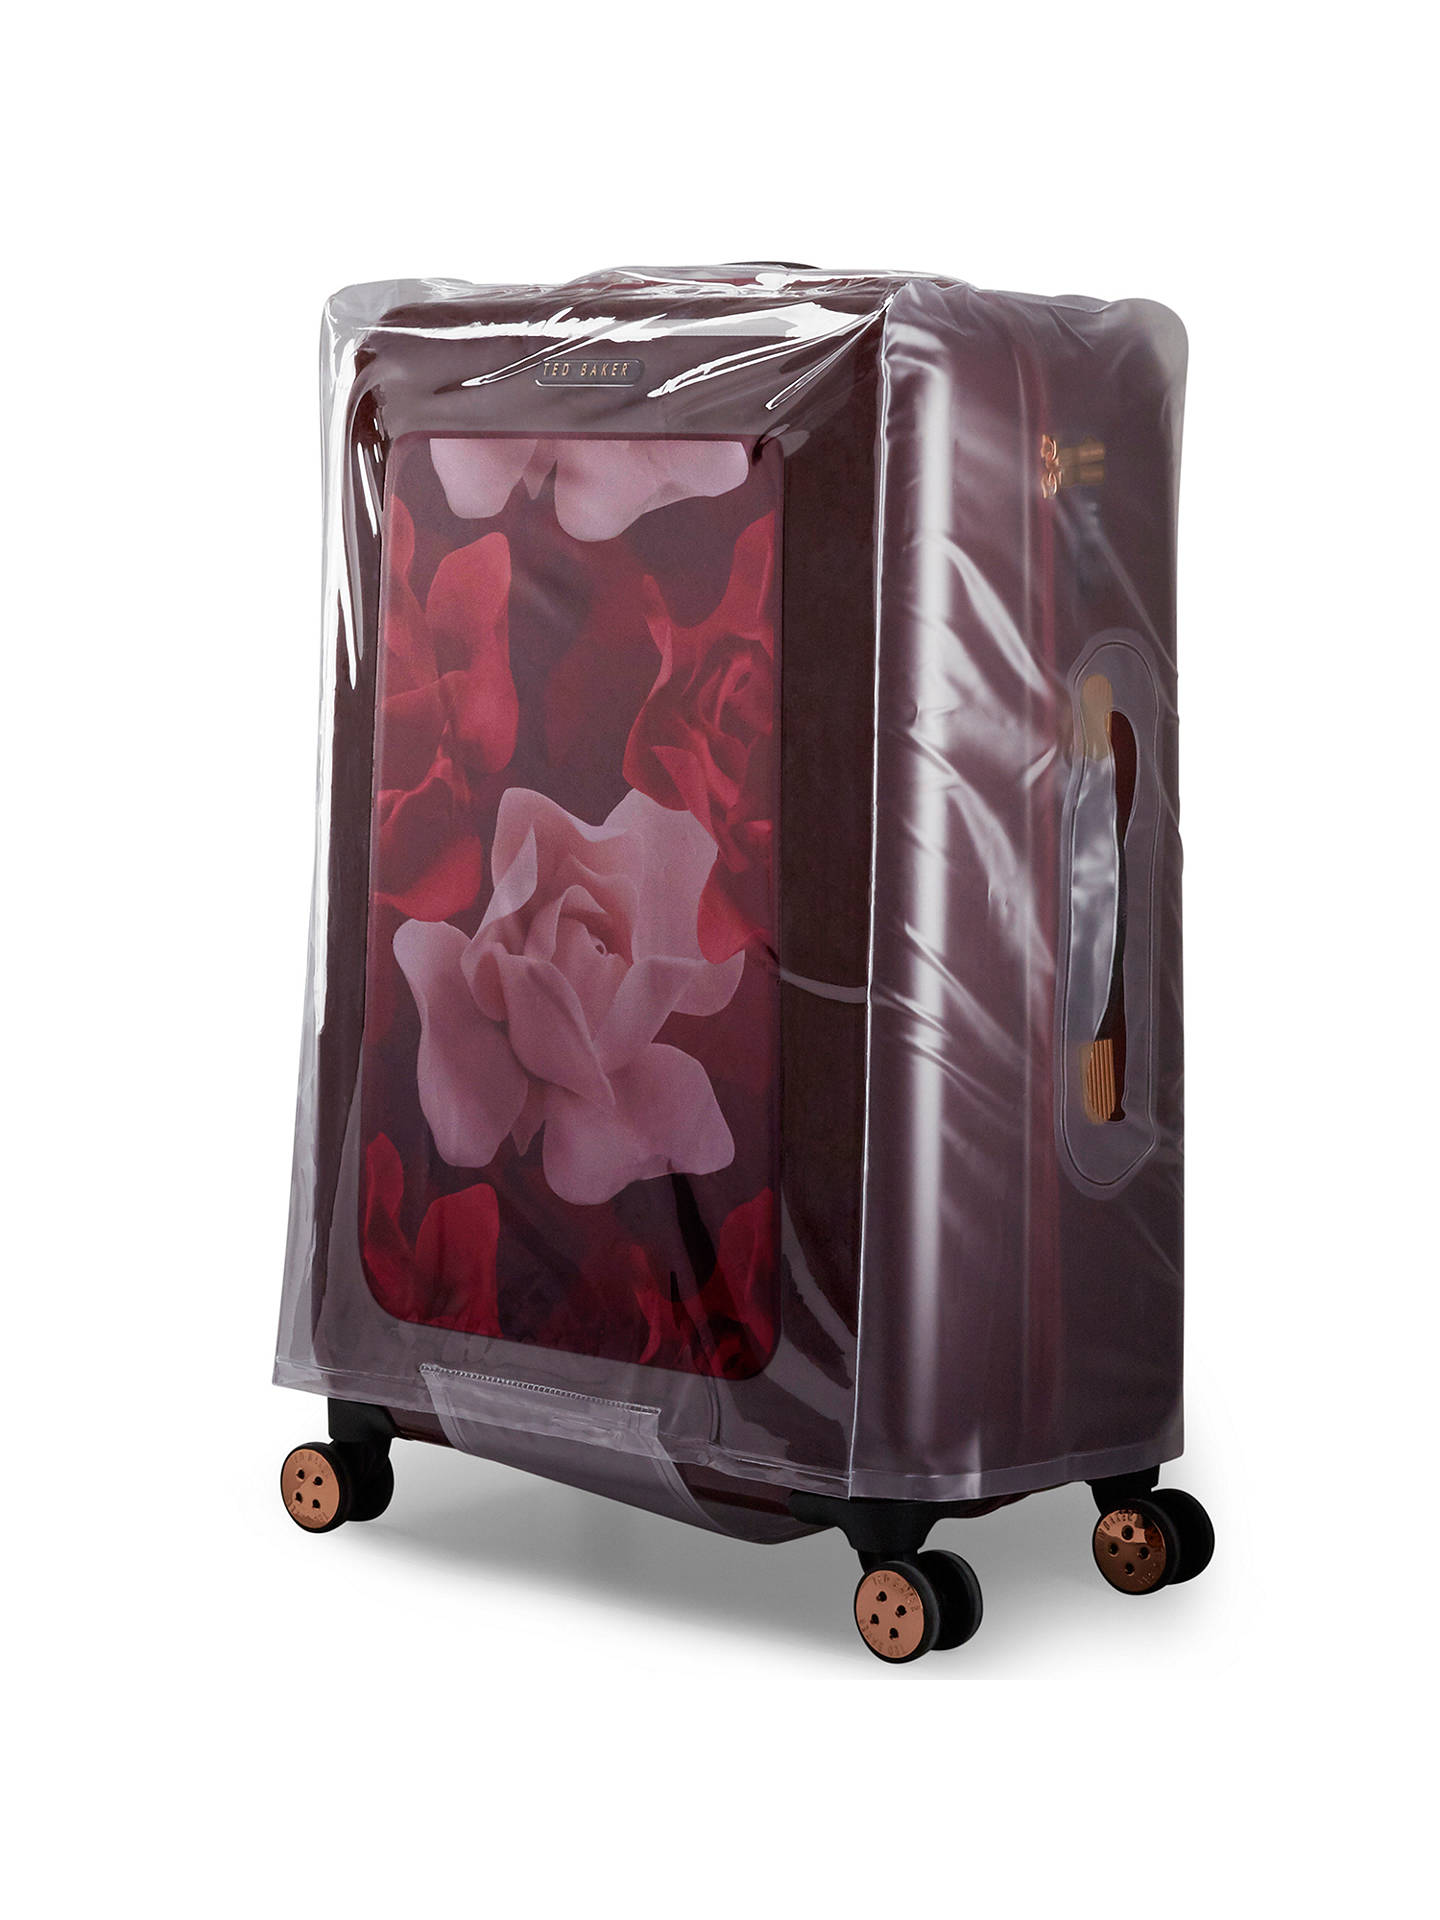 143ceedfd745 ... Buy Ted Baker Take Flight Porcelain Rose 79cm 4-Wheel Large Suitcase